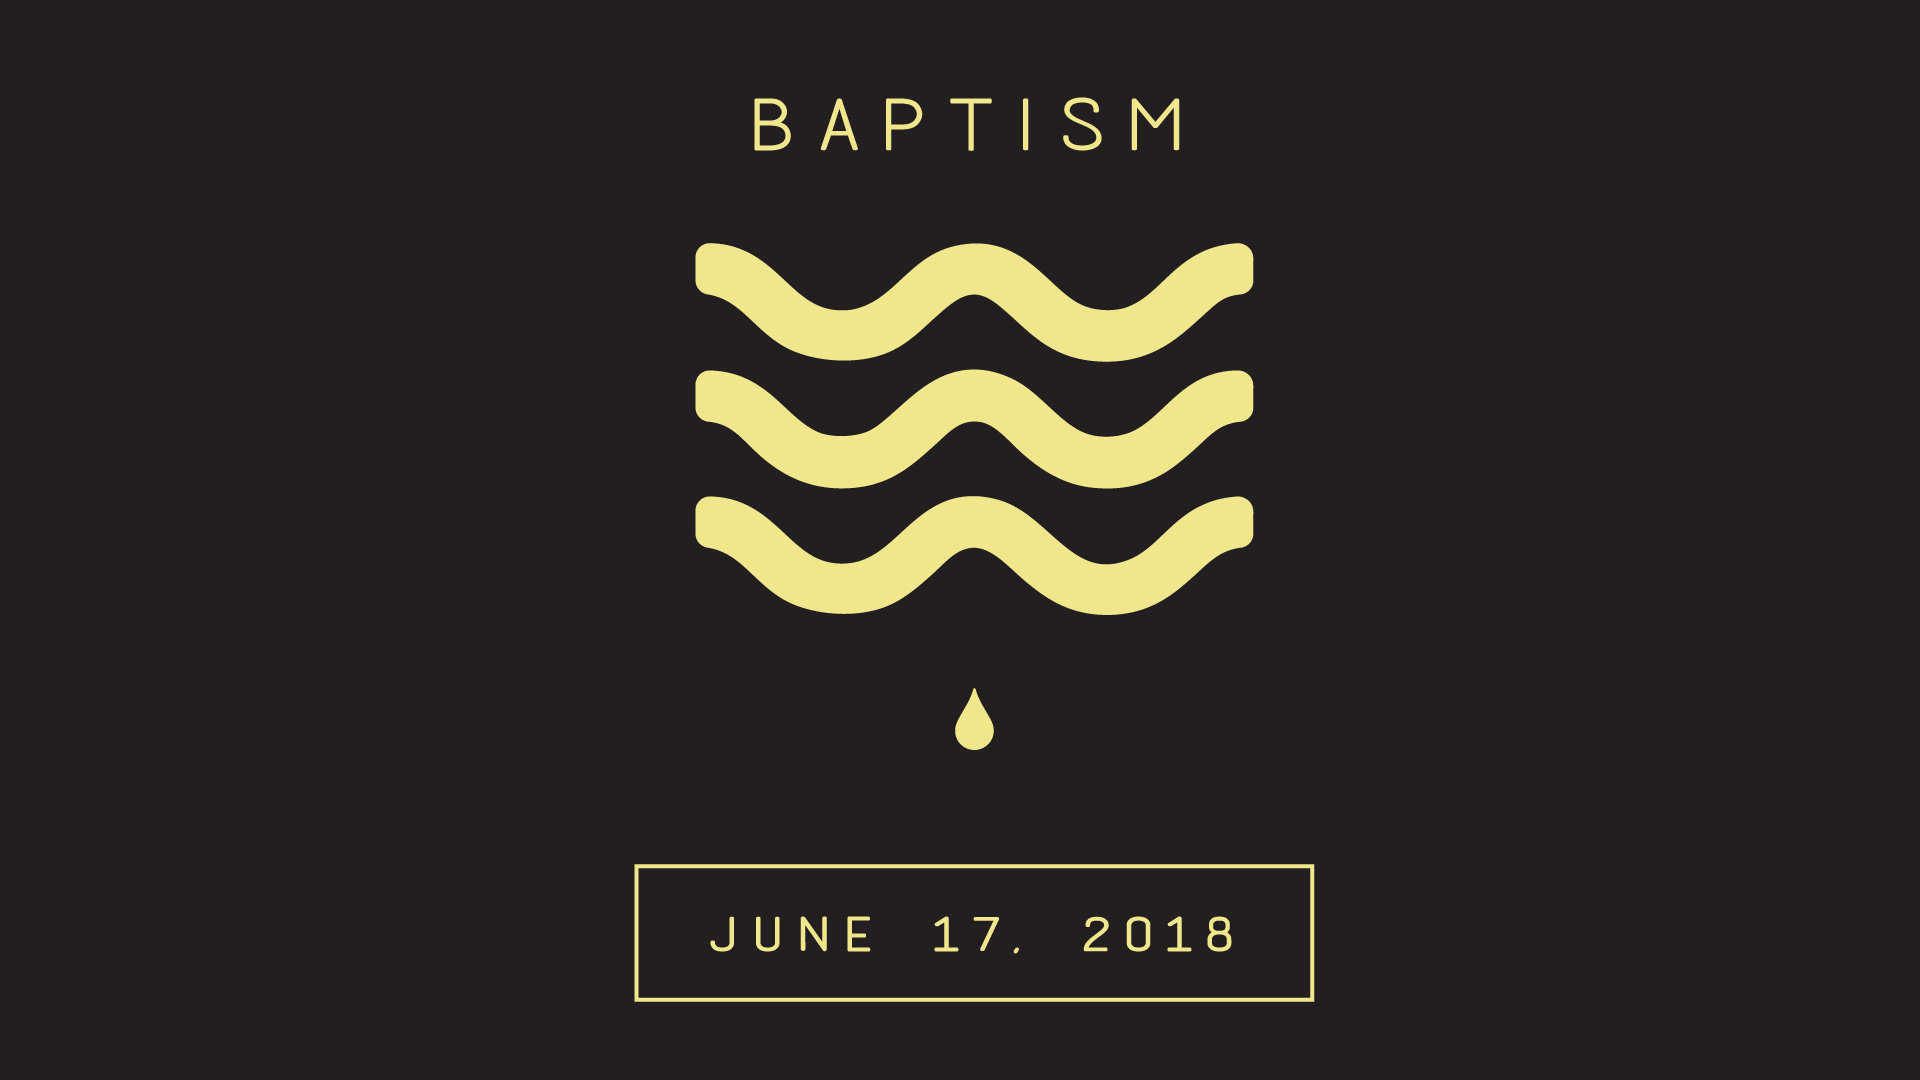 20180408 Baptism-01.png